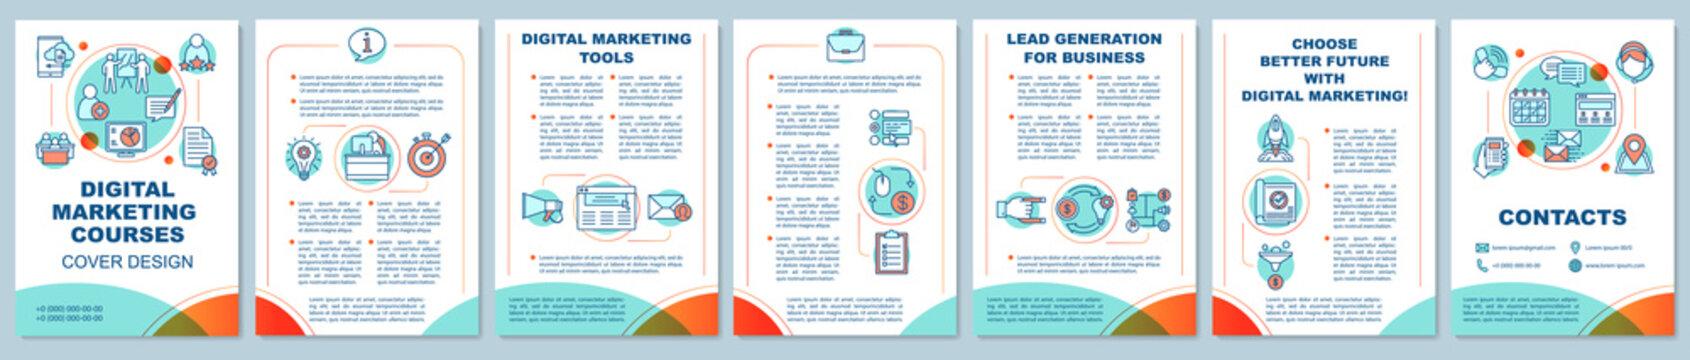 Digital marketing education brochure template layout